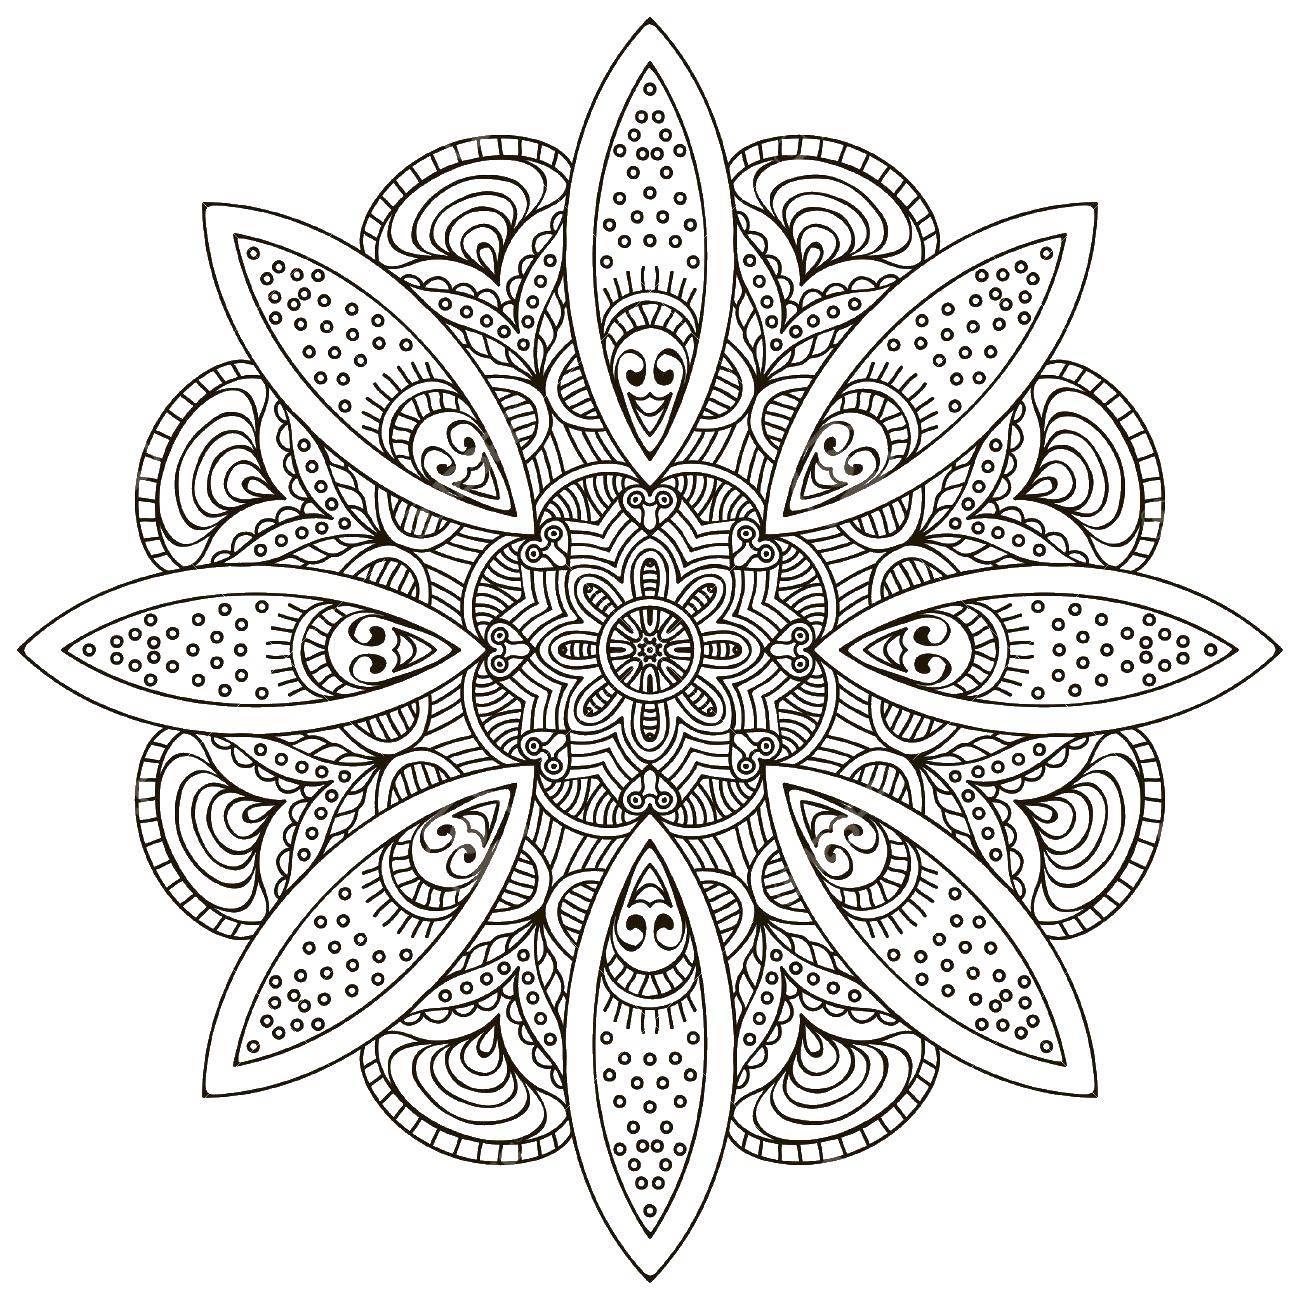 раскраски узором раскраска цветы узором раскраски антистресс